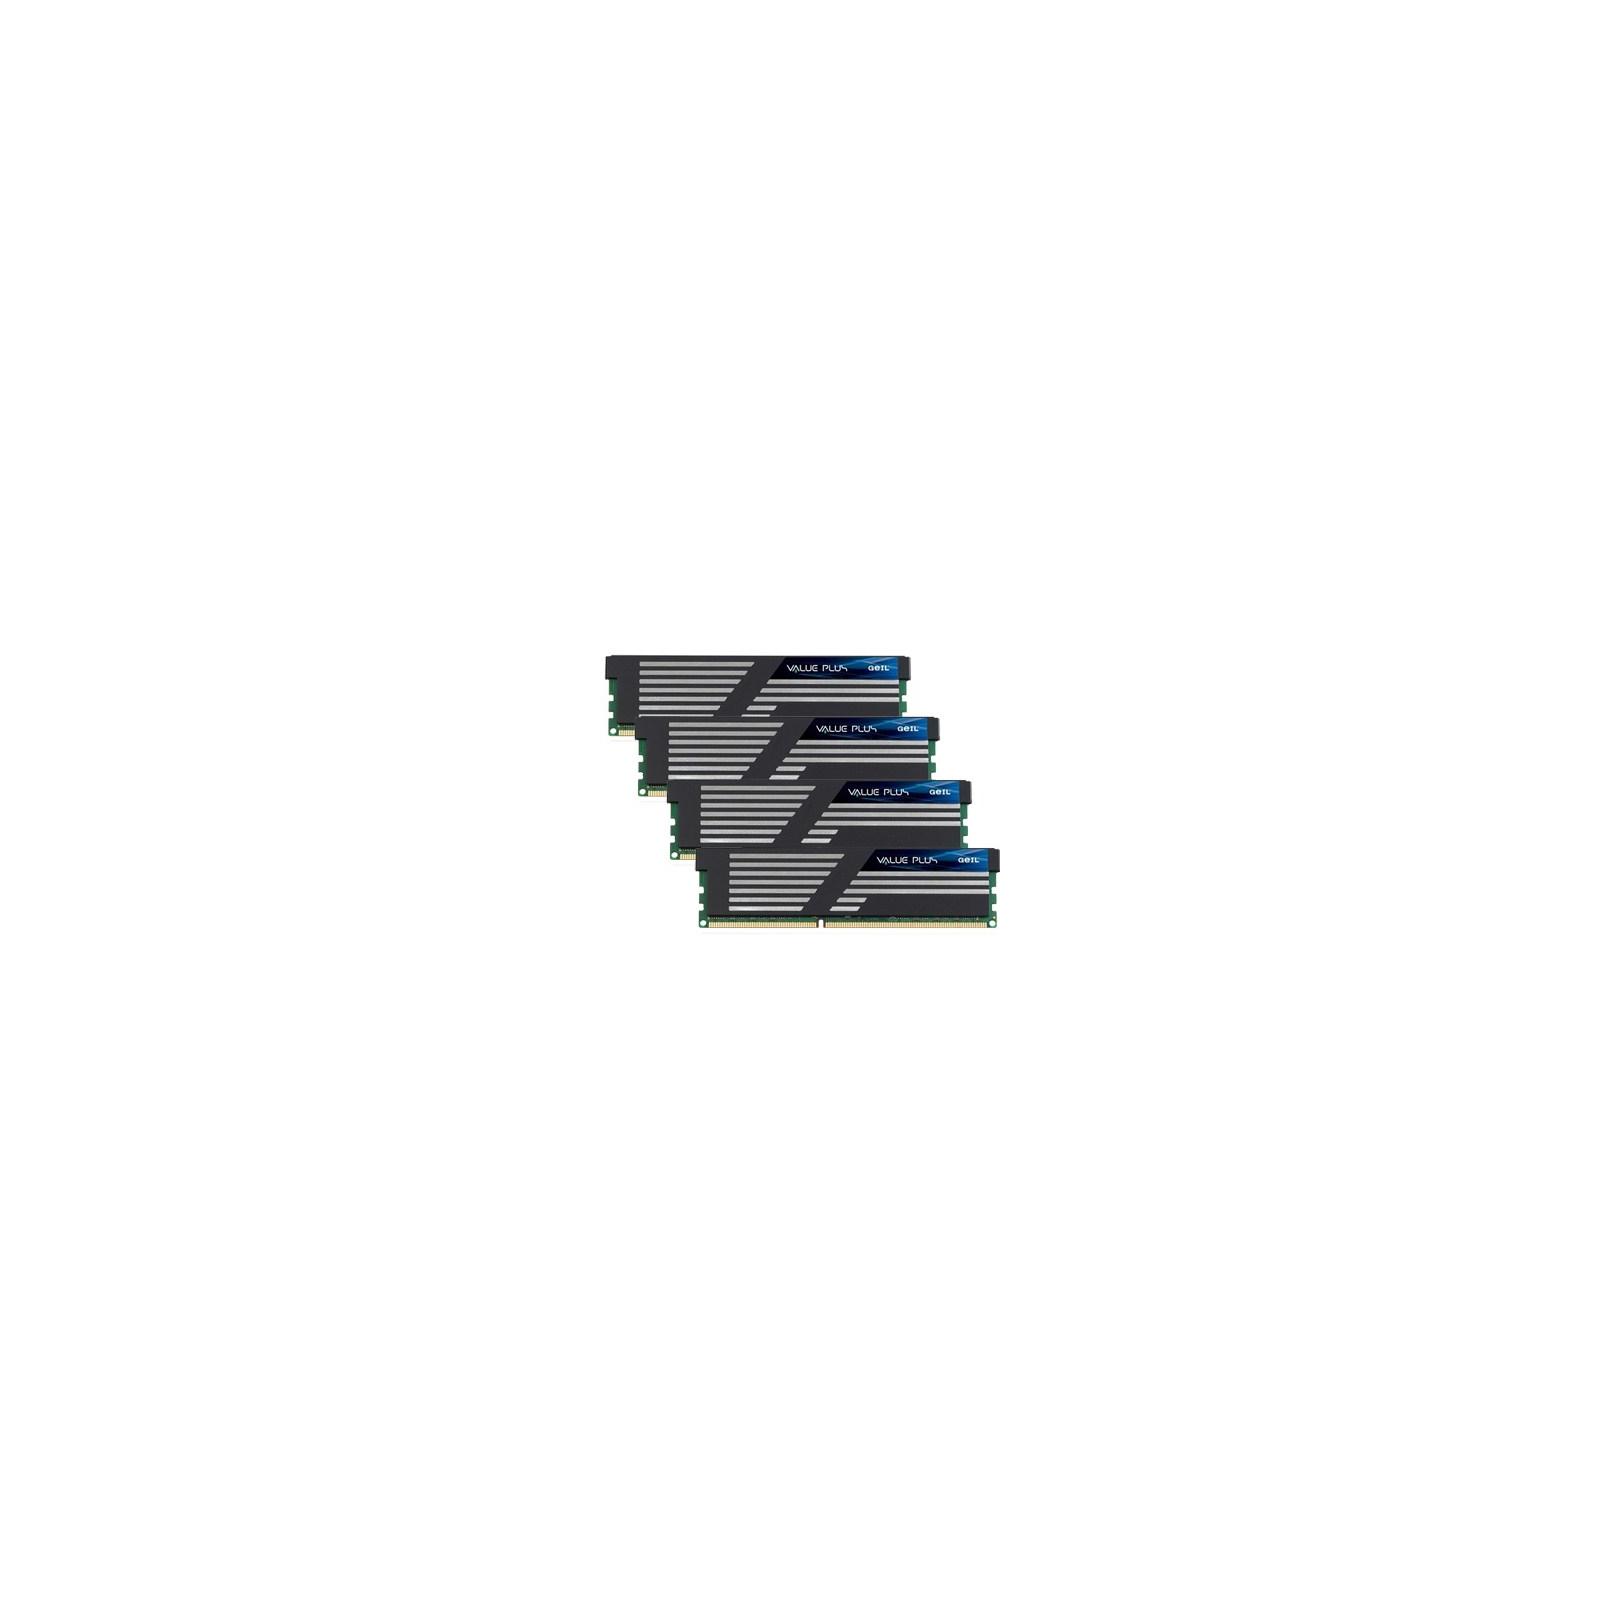 Модуль памяти для компьютера DDR3 16GB (4x4GB) 1600 MHz GEIL (GVP316GB1600C9QC)